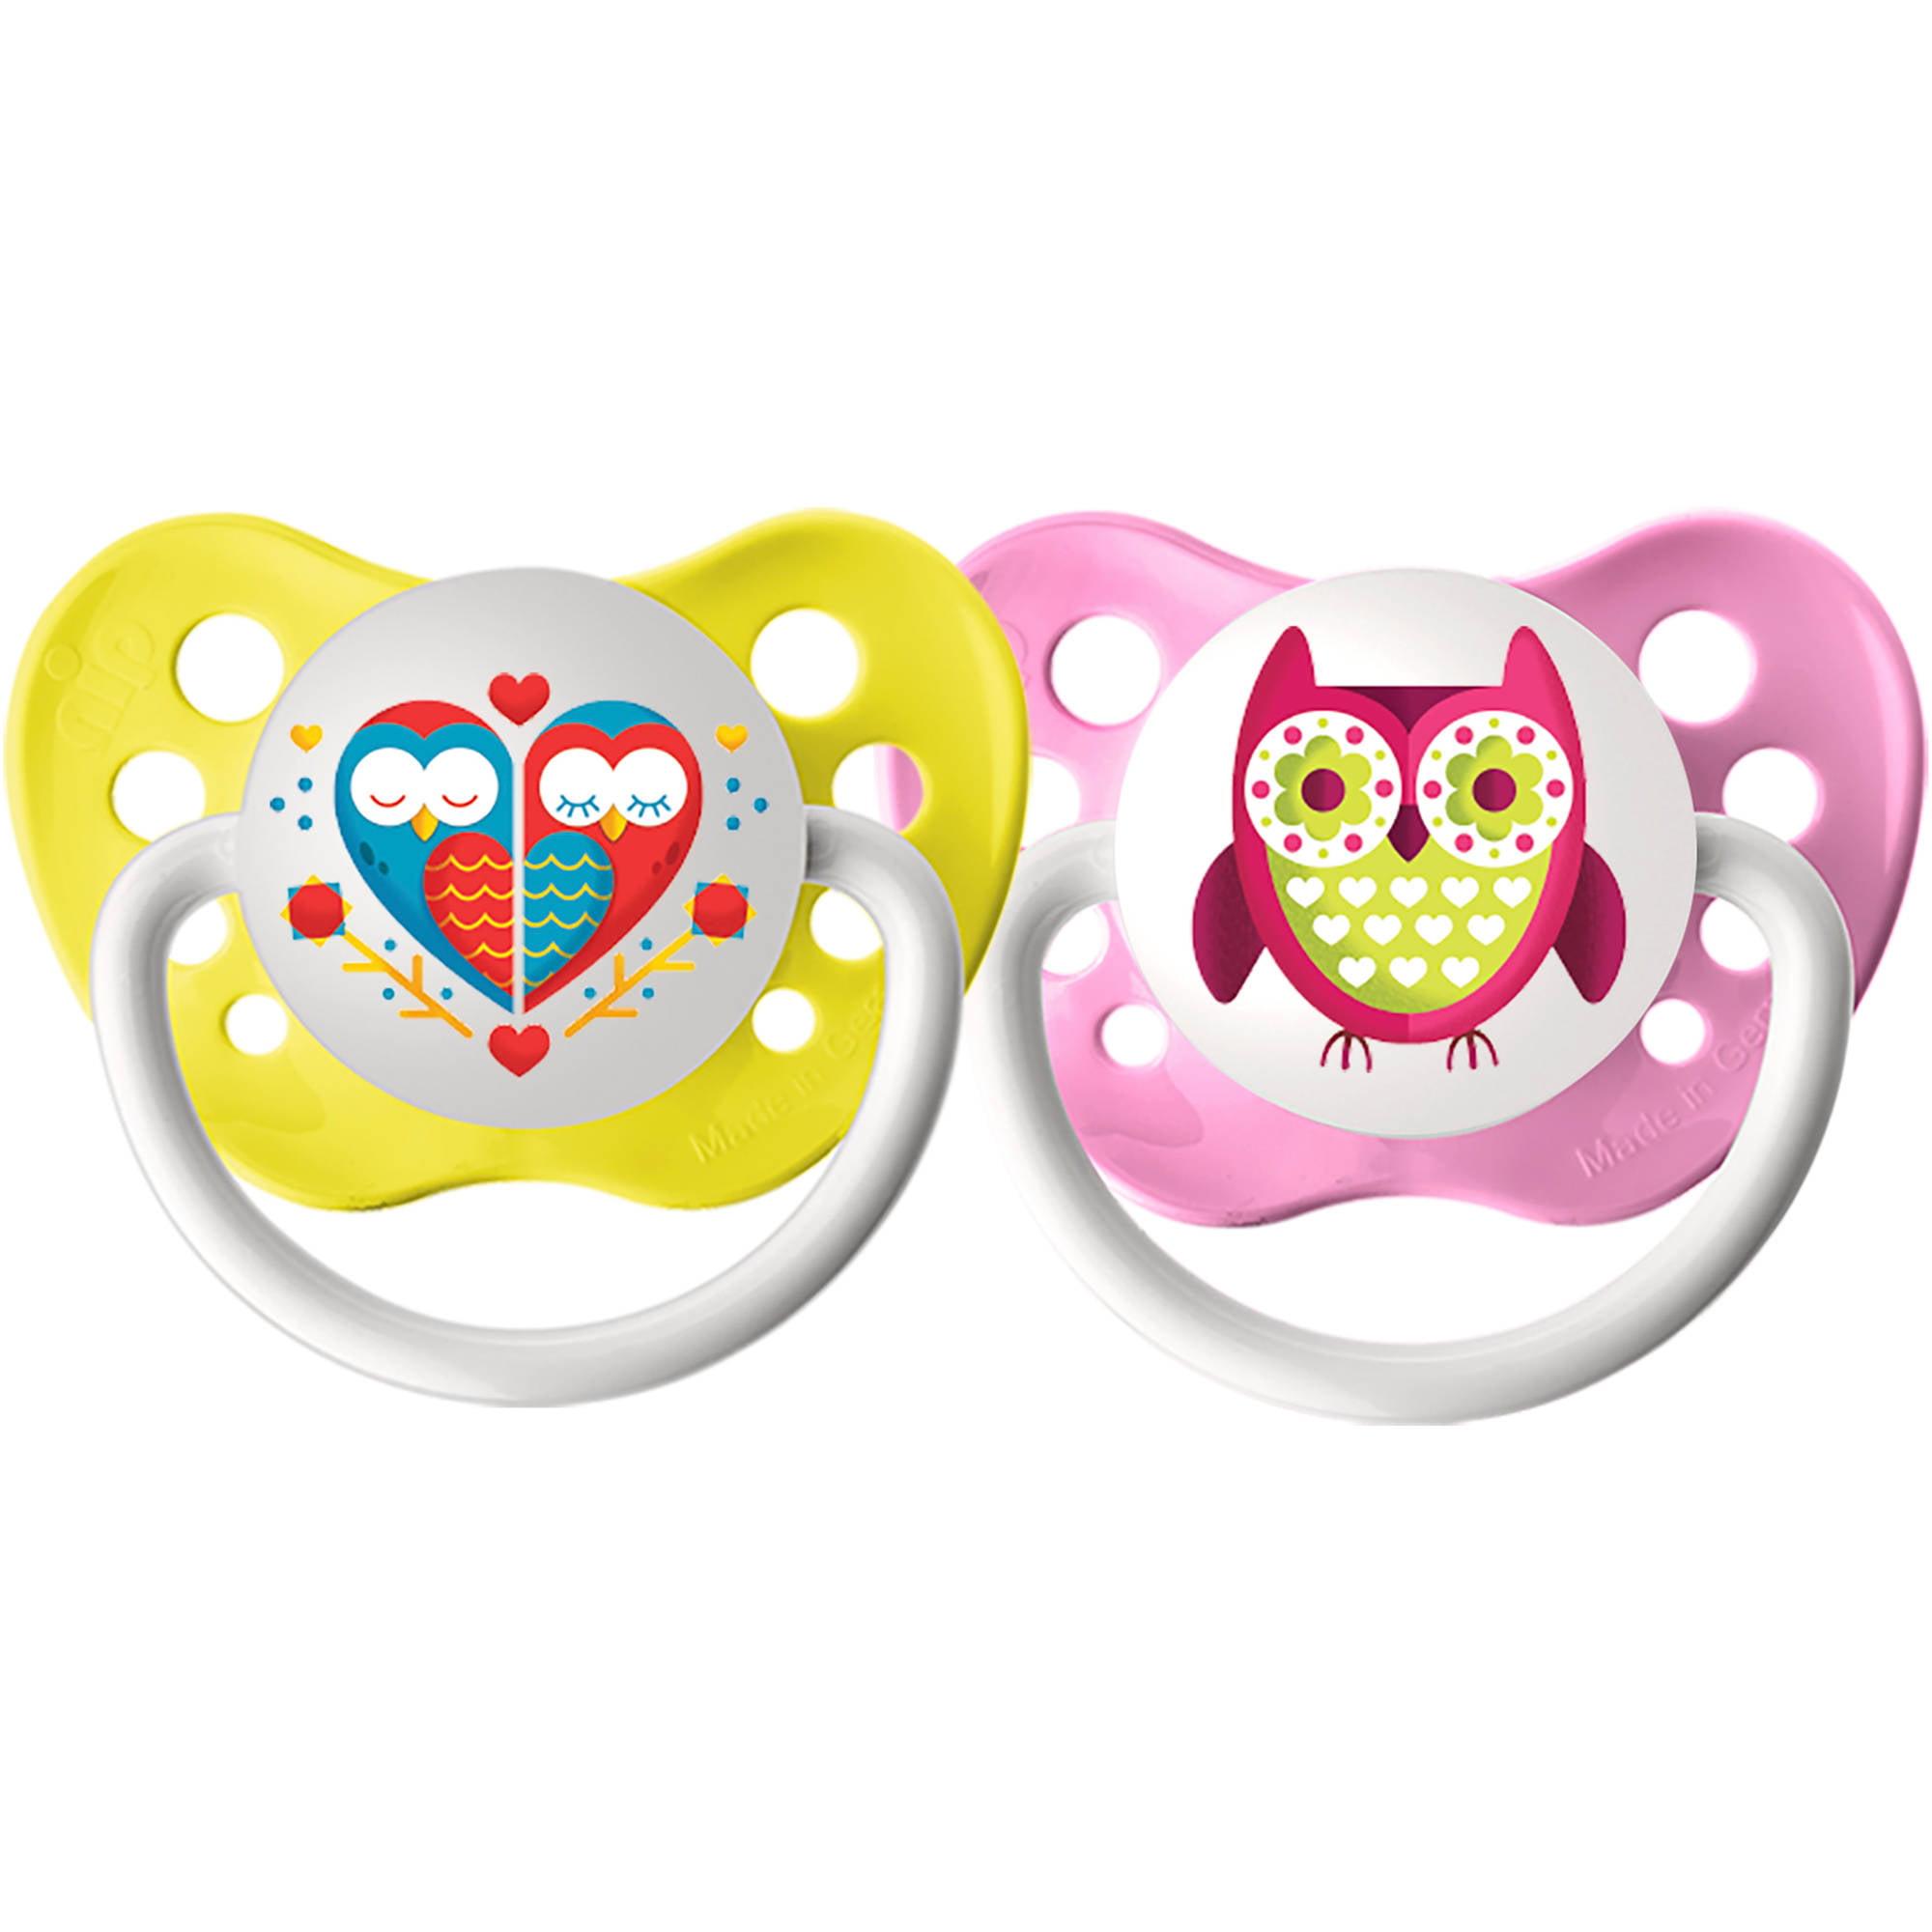 Ulubulu Love Birds/Owl, 6-18 Month, 2 -Pack